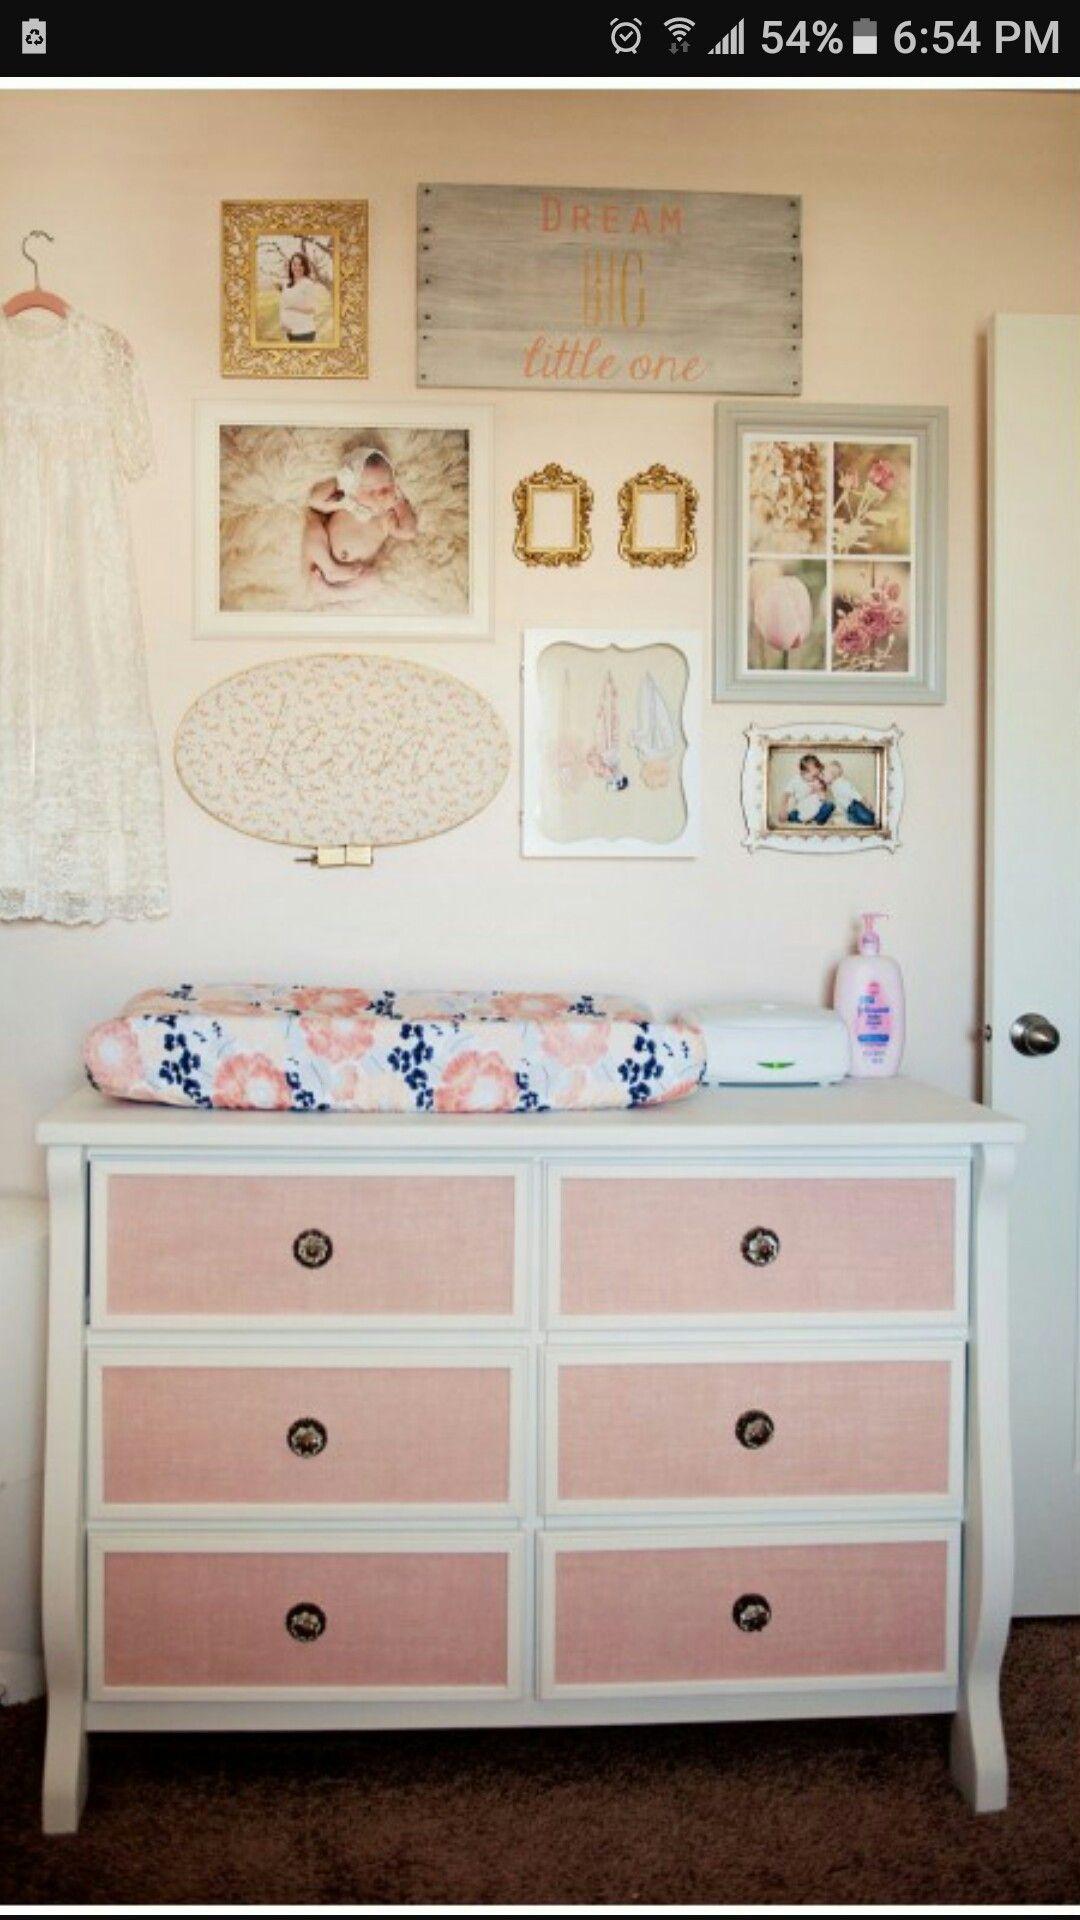 Pin by Melanie Trickett on abbi's room ideas Utah homes